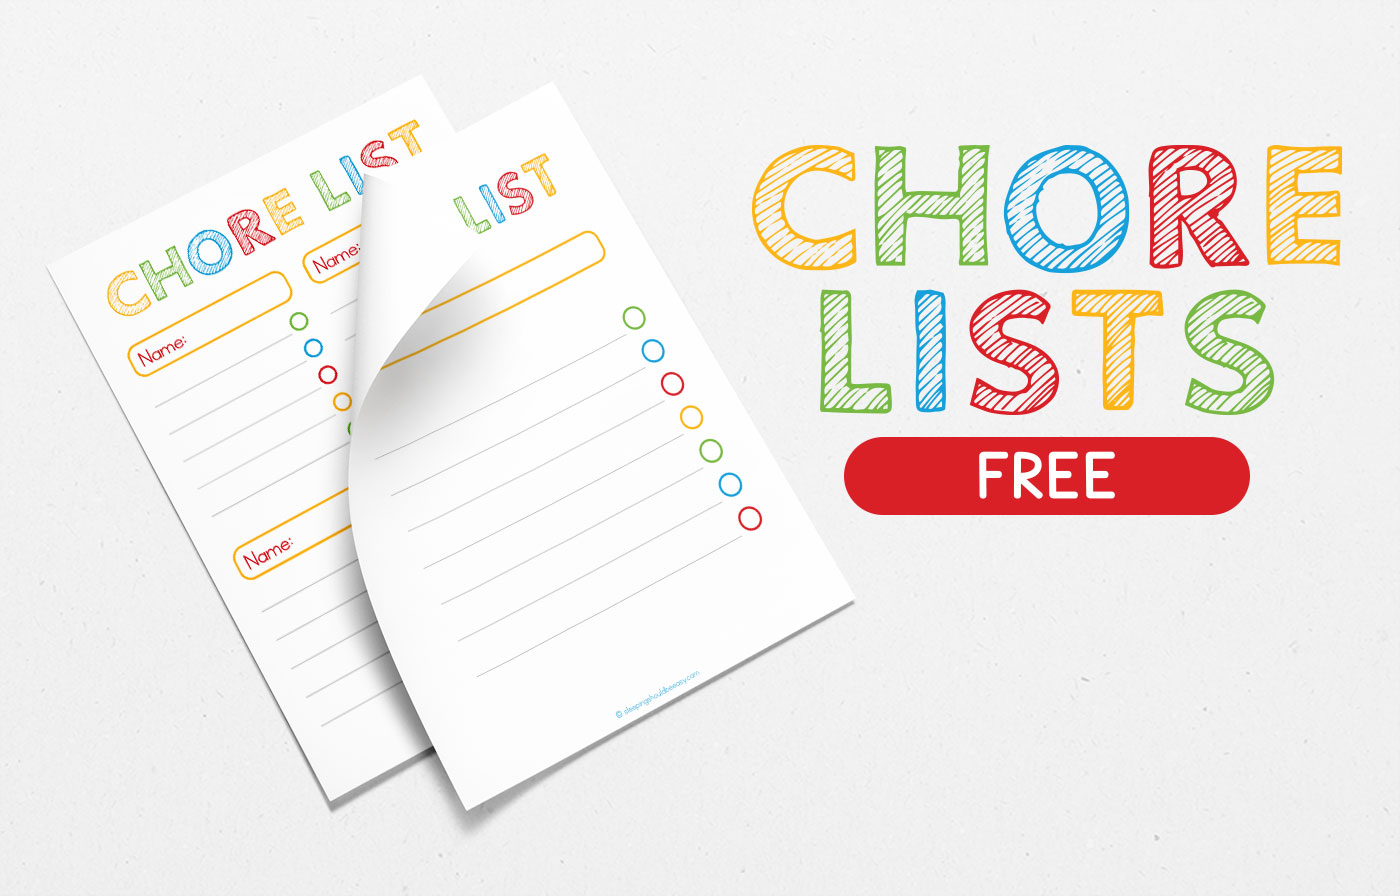 Free Chore Lists